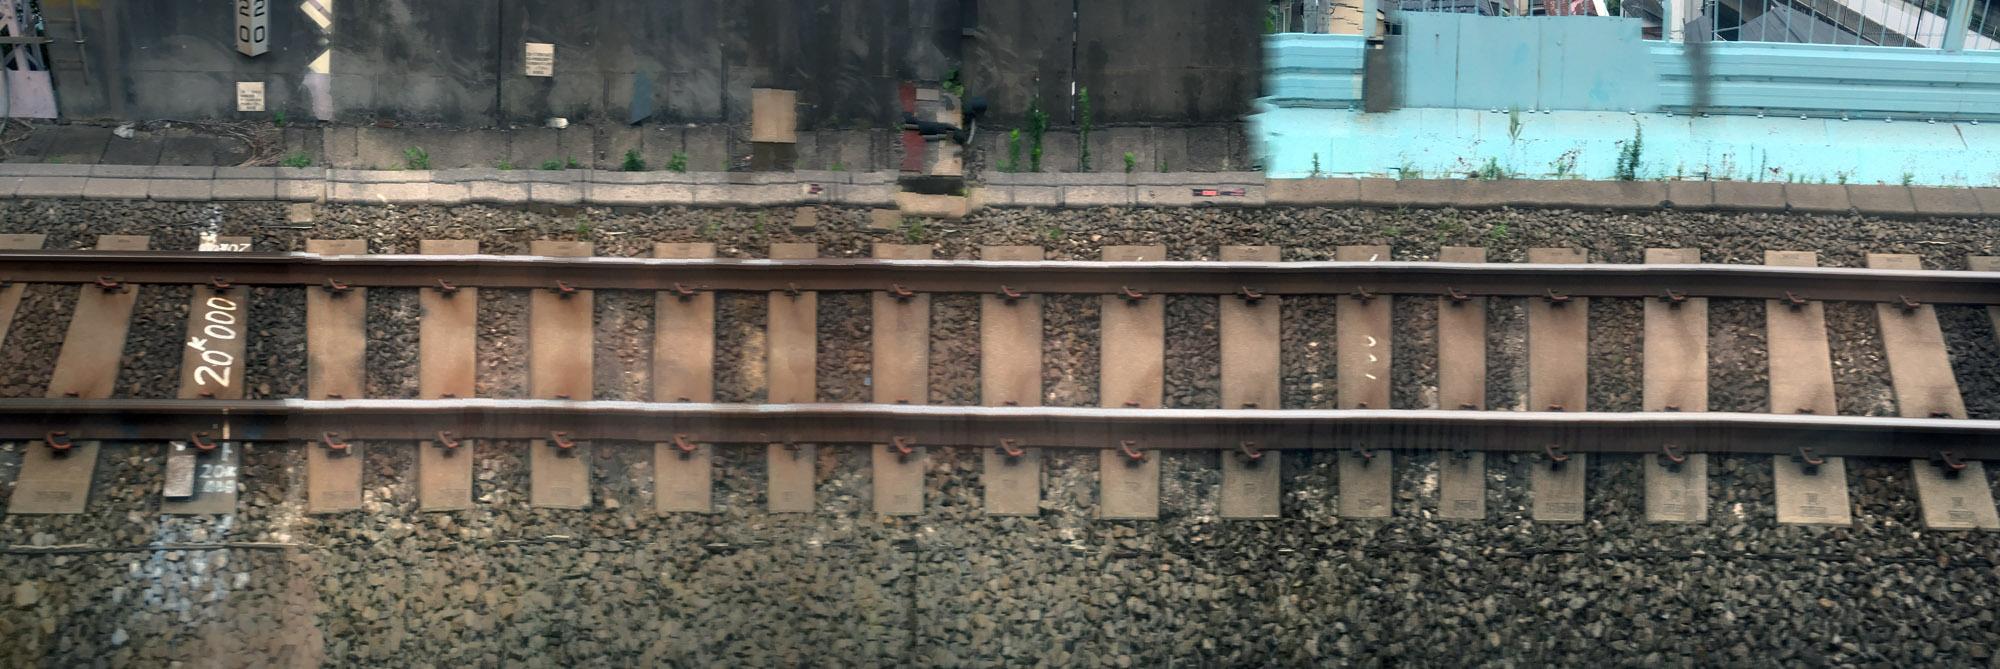 salomon-Rapid Express_0135 ties